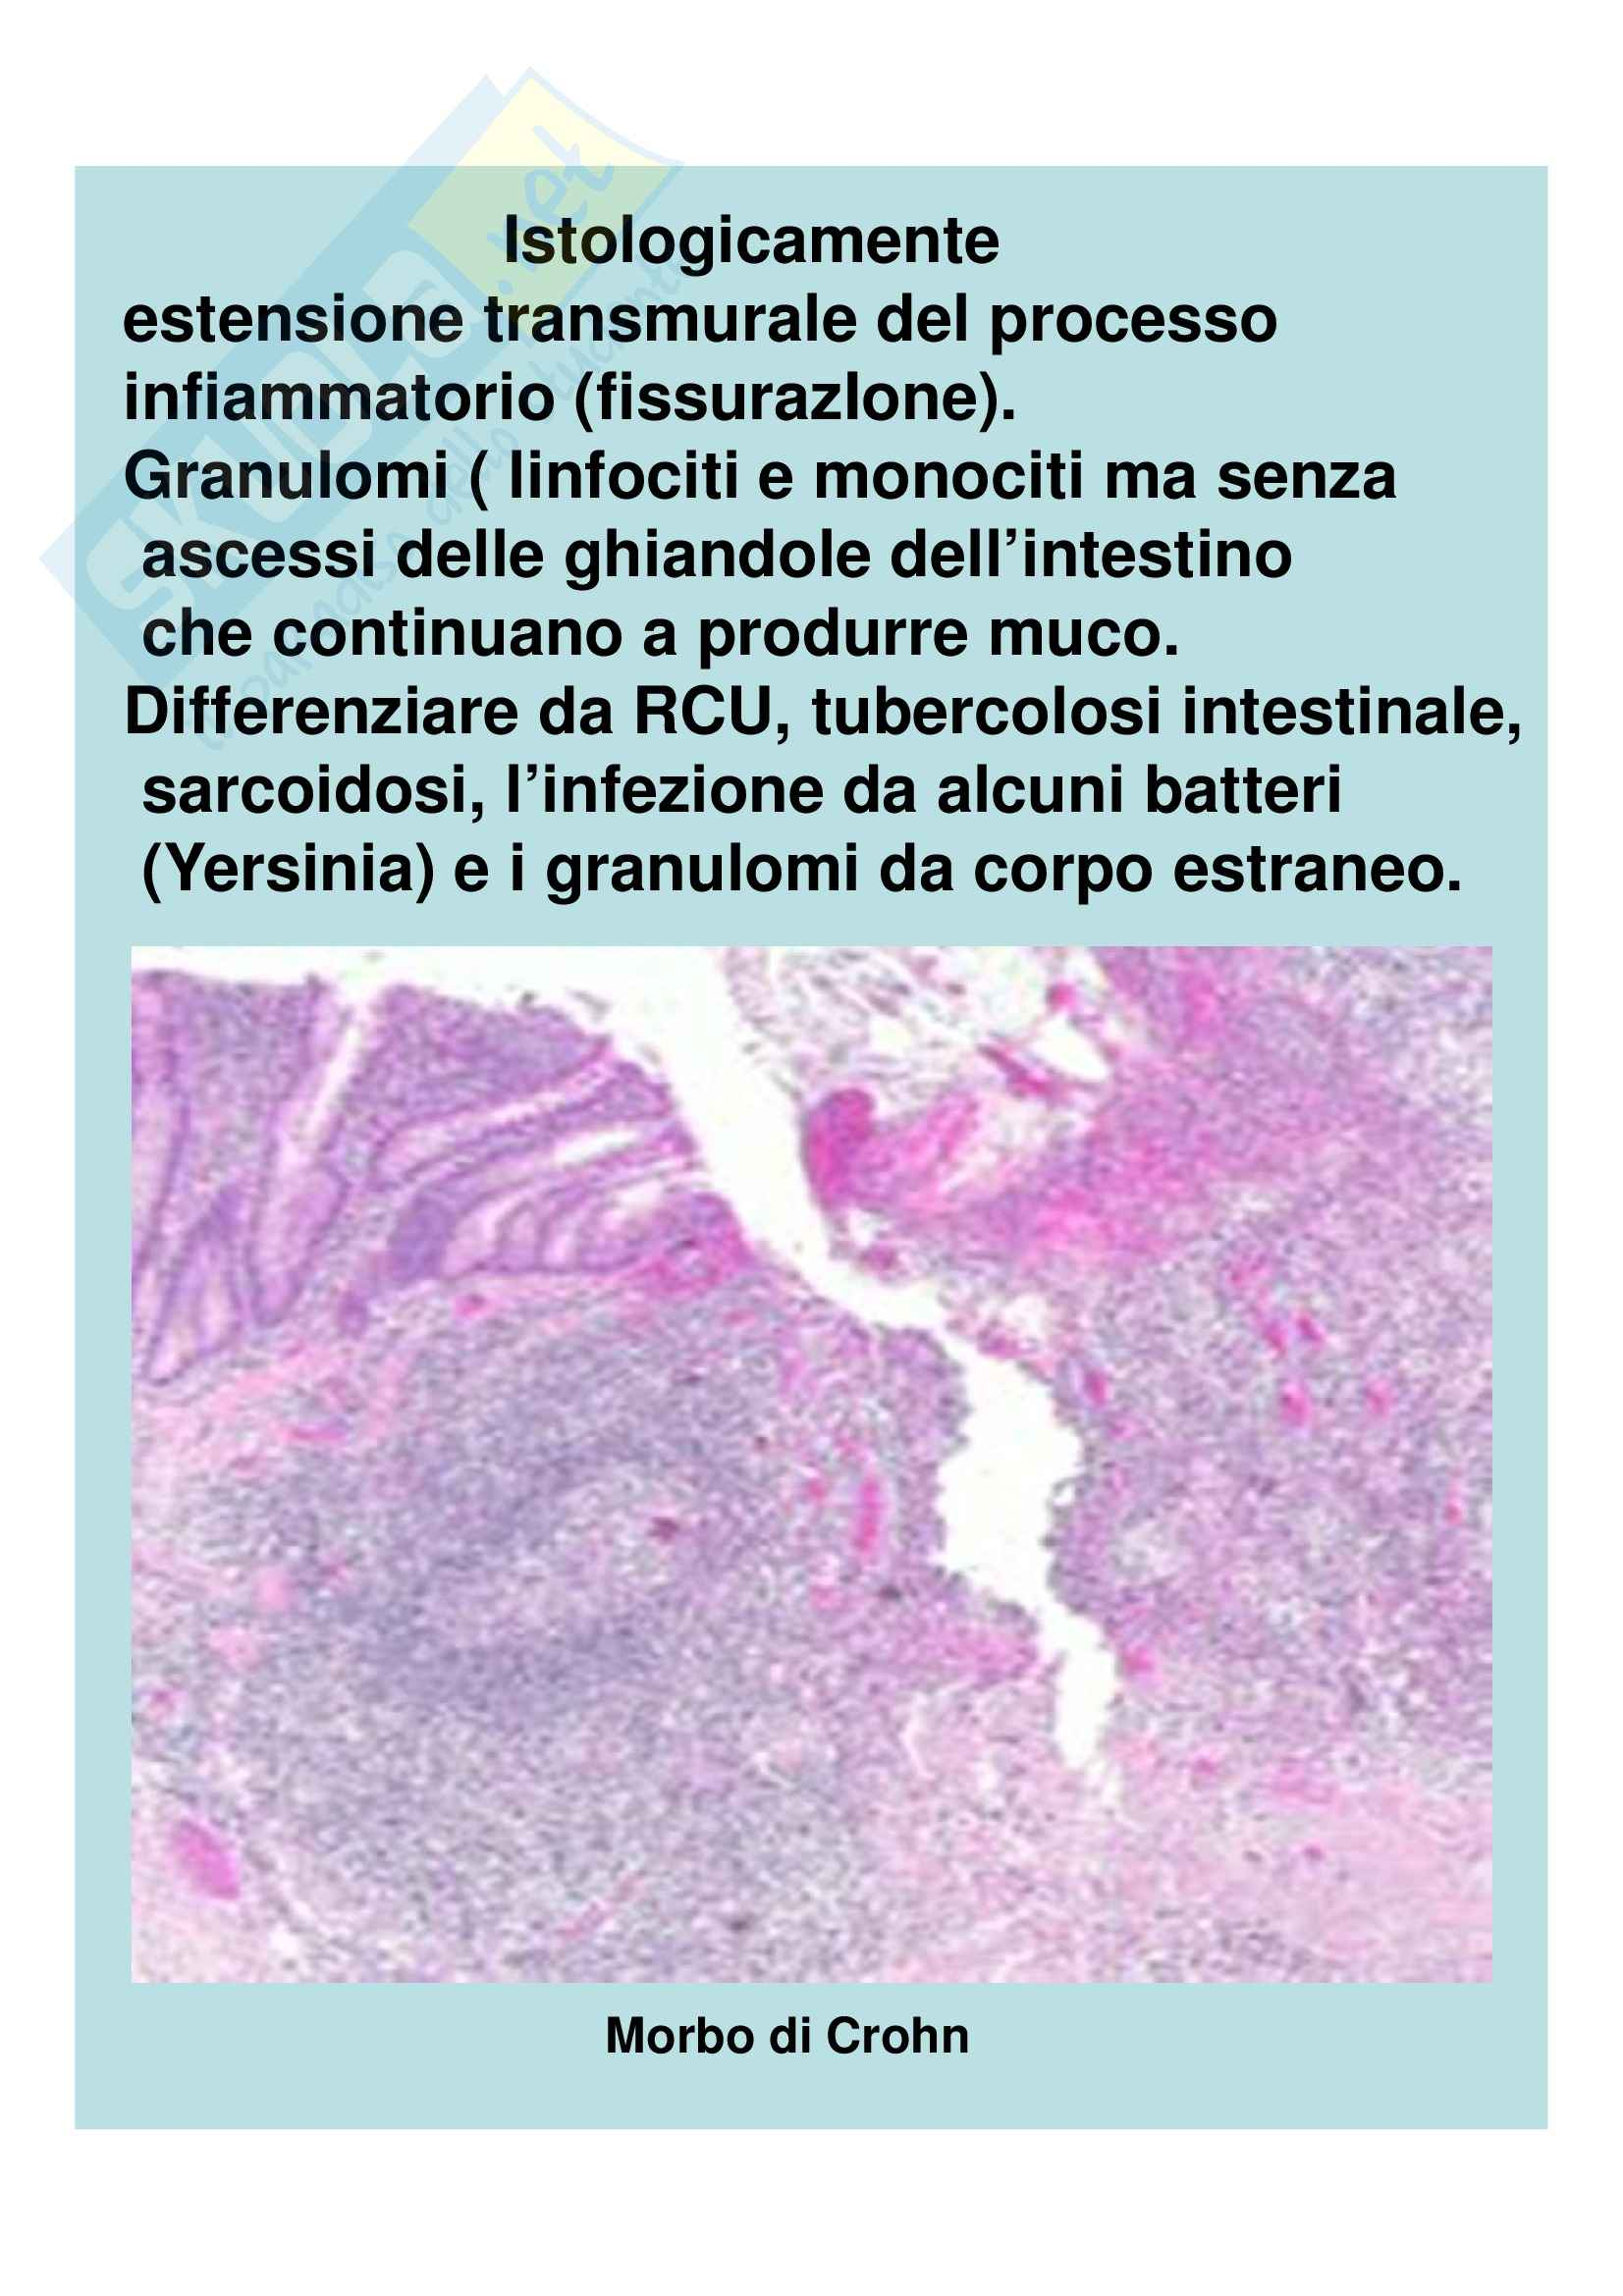 Medicina interna - diarrea cronica Pag. 26